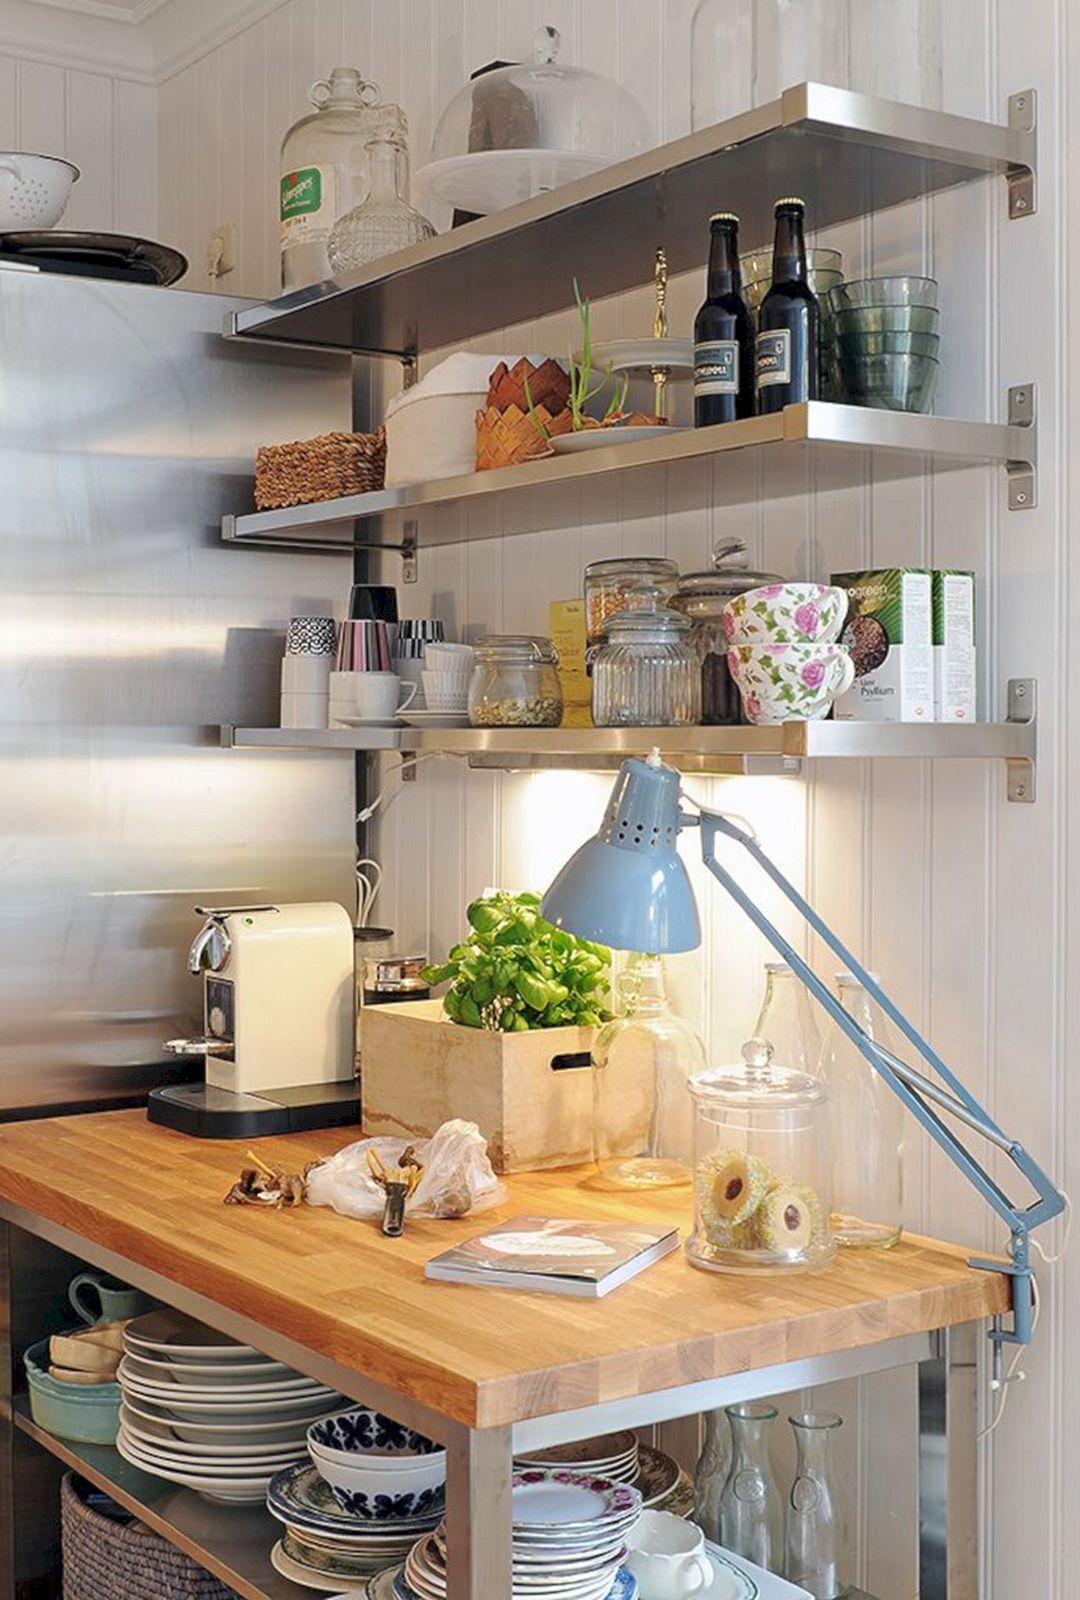 10 astonishing diy kitchen storage solution for small space kitchen shelf design diy kitchen on kitchen organization for small spaces id=85974